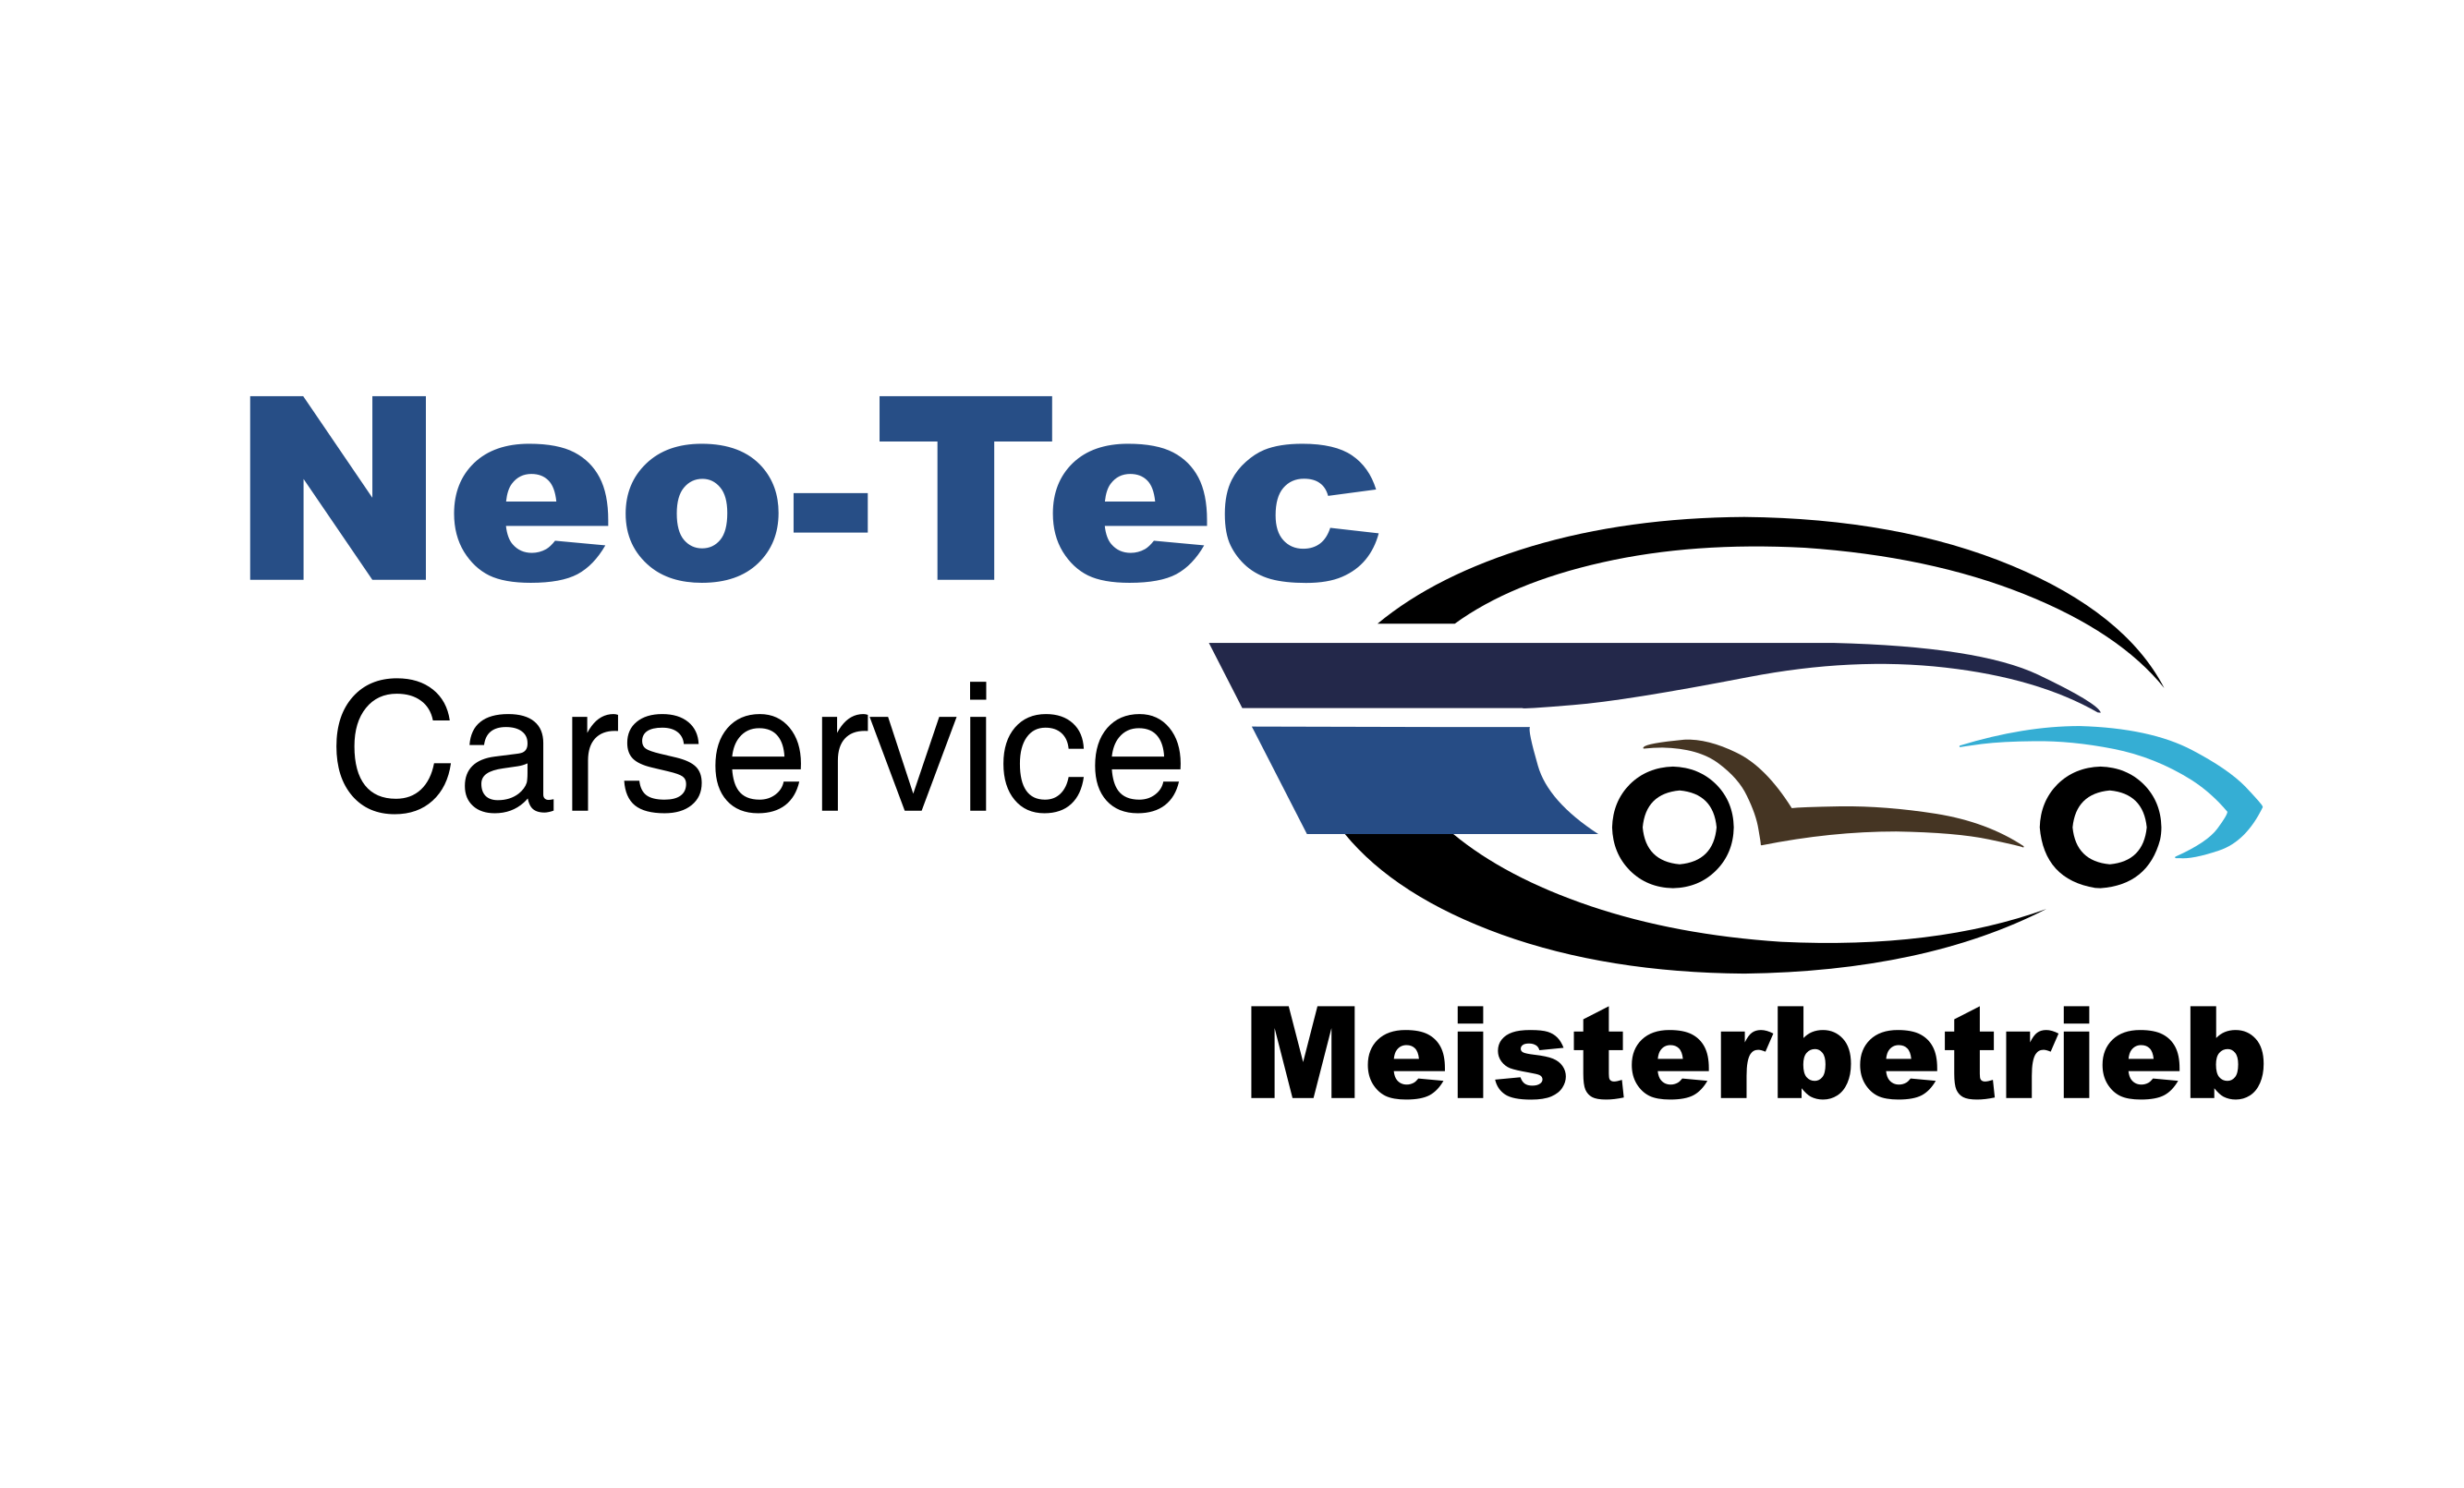 Neo-Tec Carservice